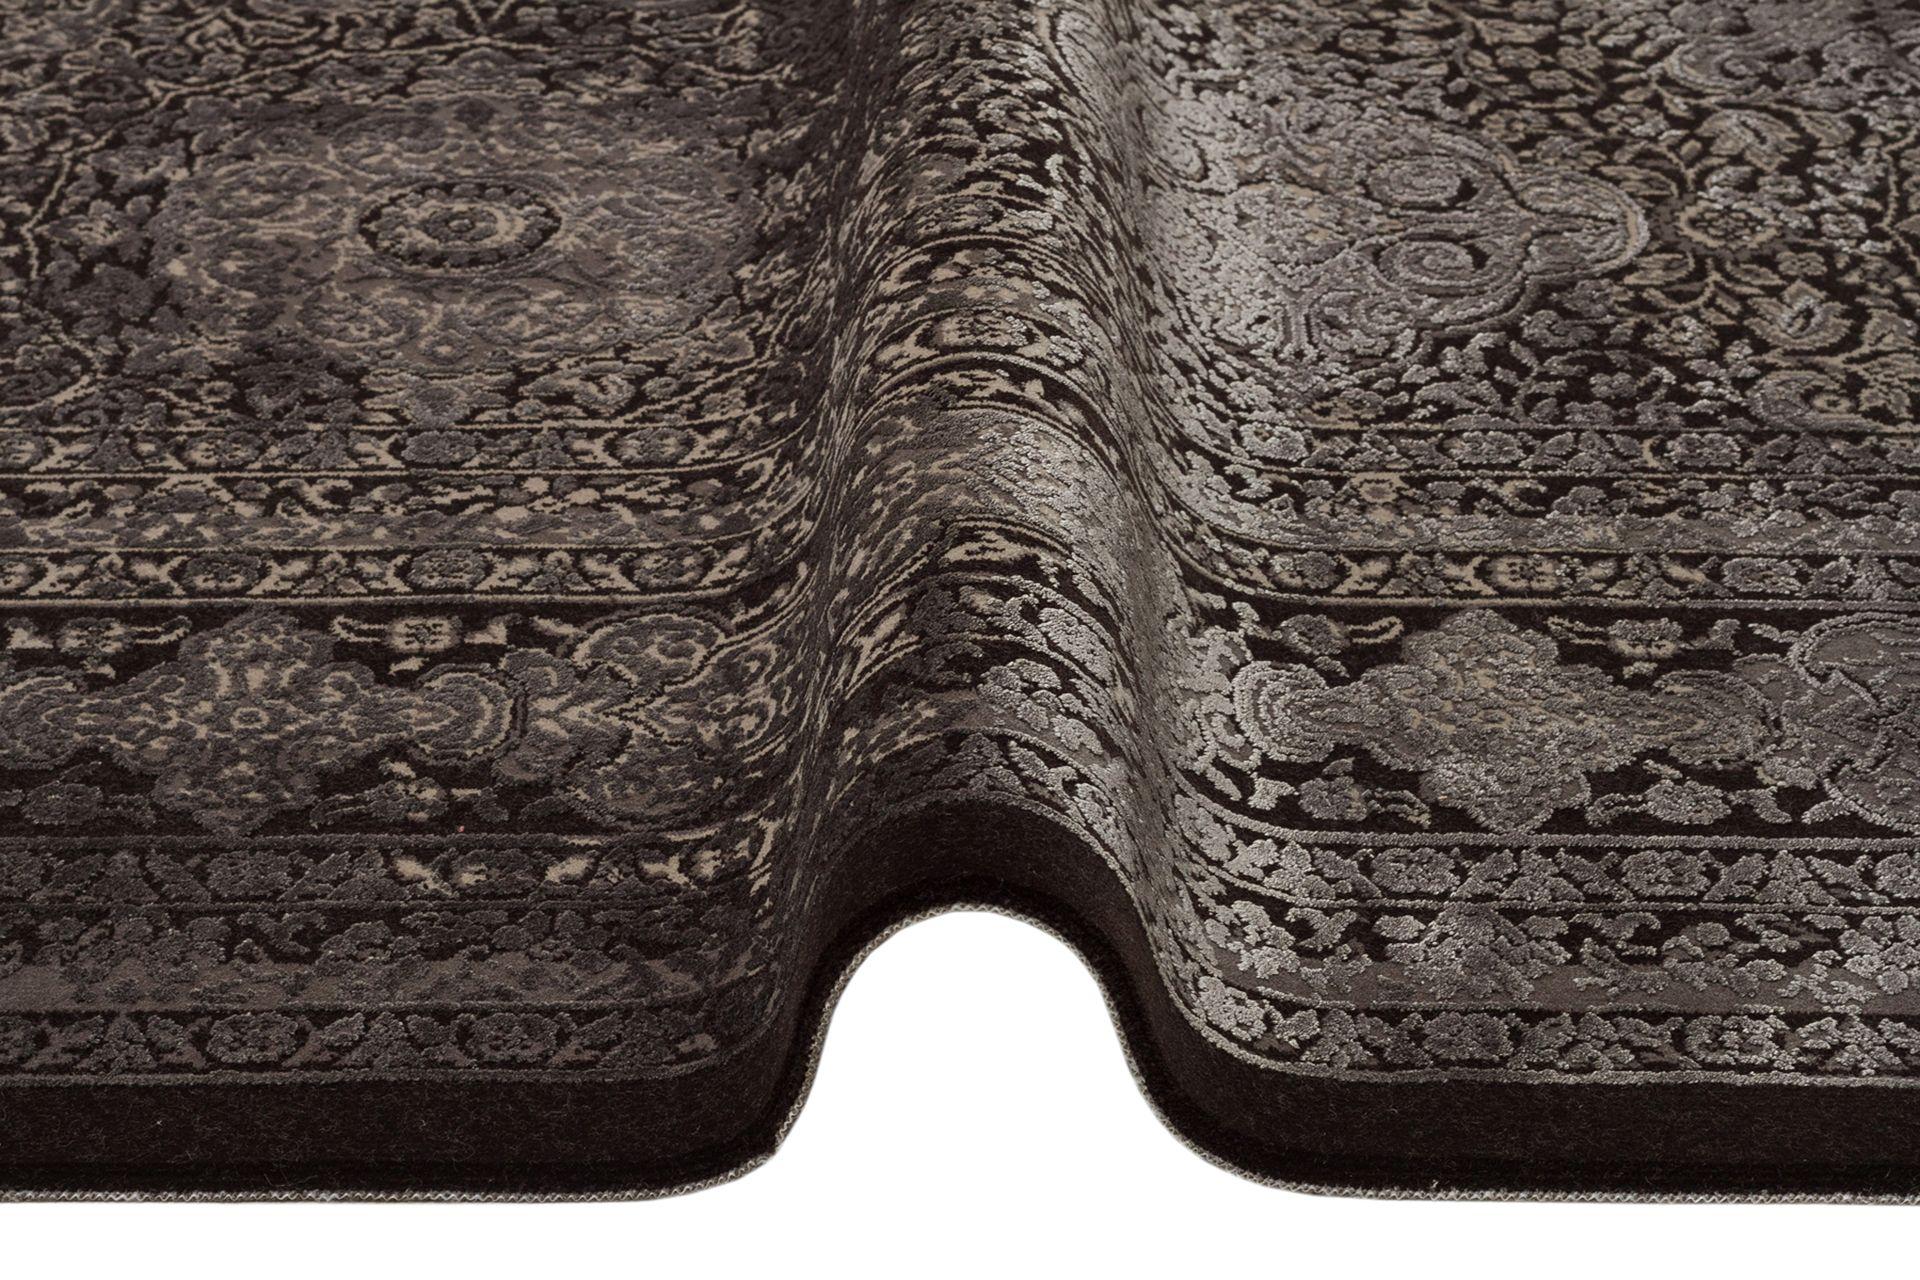 ANADOLU AD 02 ANTRASİT GRİ KLASİK DESENLİ SALON HALISI 100x200